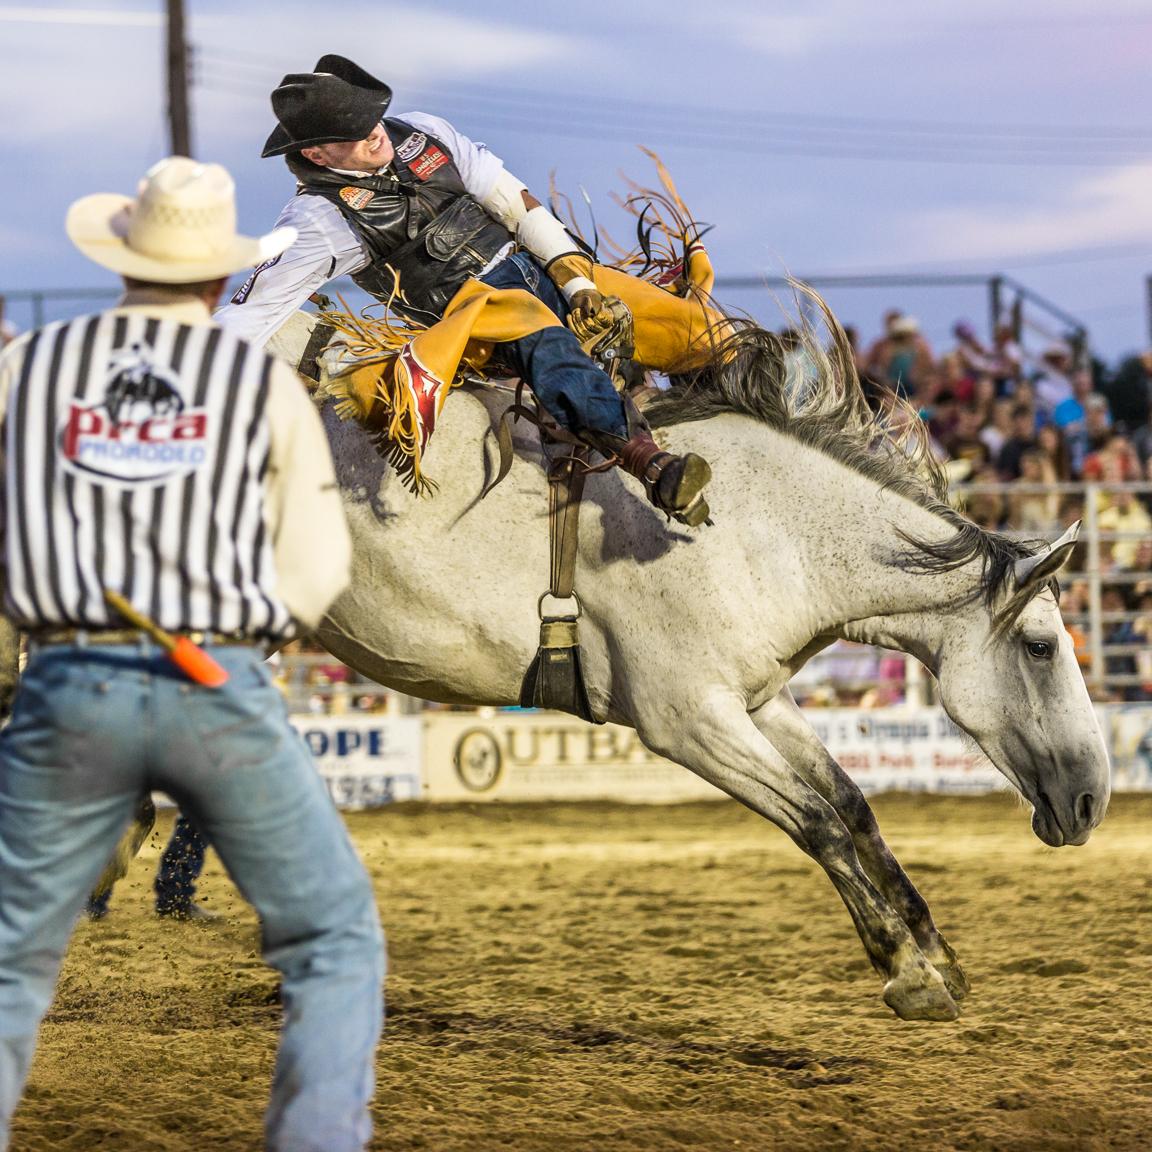 Dustin-DeYoe-Photography-Bronc-Riding-5.jpg